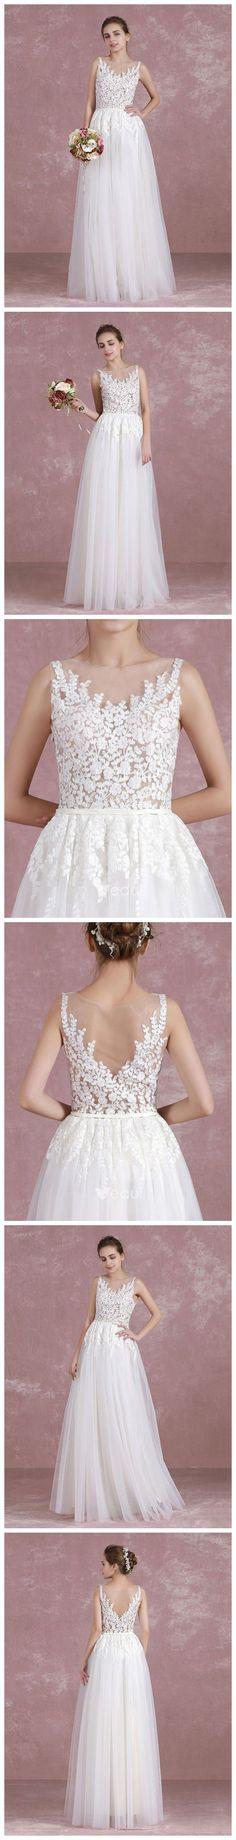 CHIC A-LINE SCOOP TULLE WHITE APPLIQUE LONG PROM DRESS WEDDING DRESS AM727 #white #lace #weddingdress